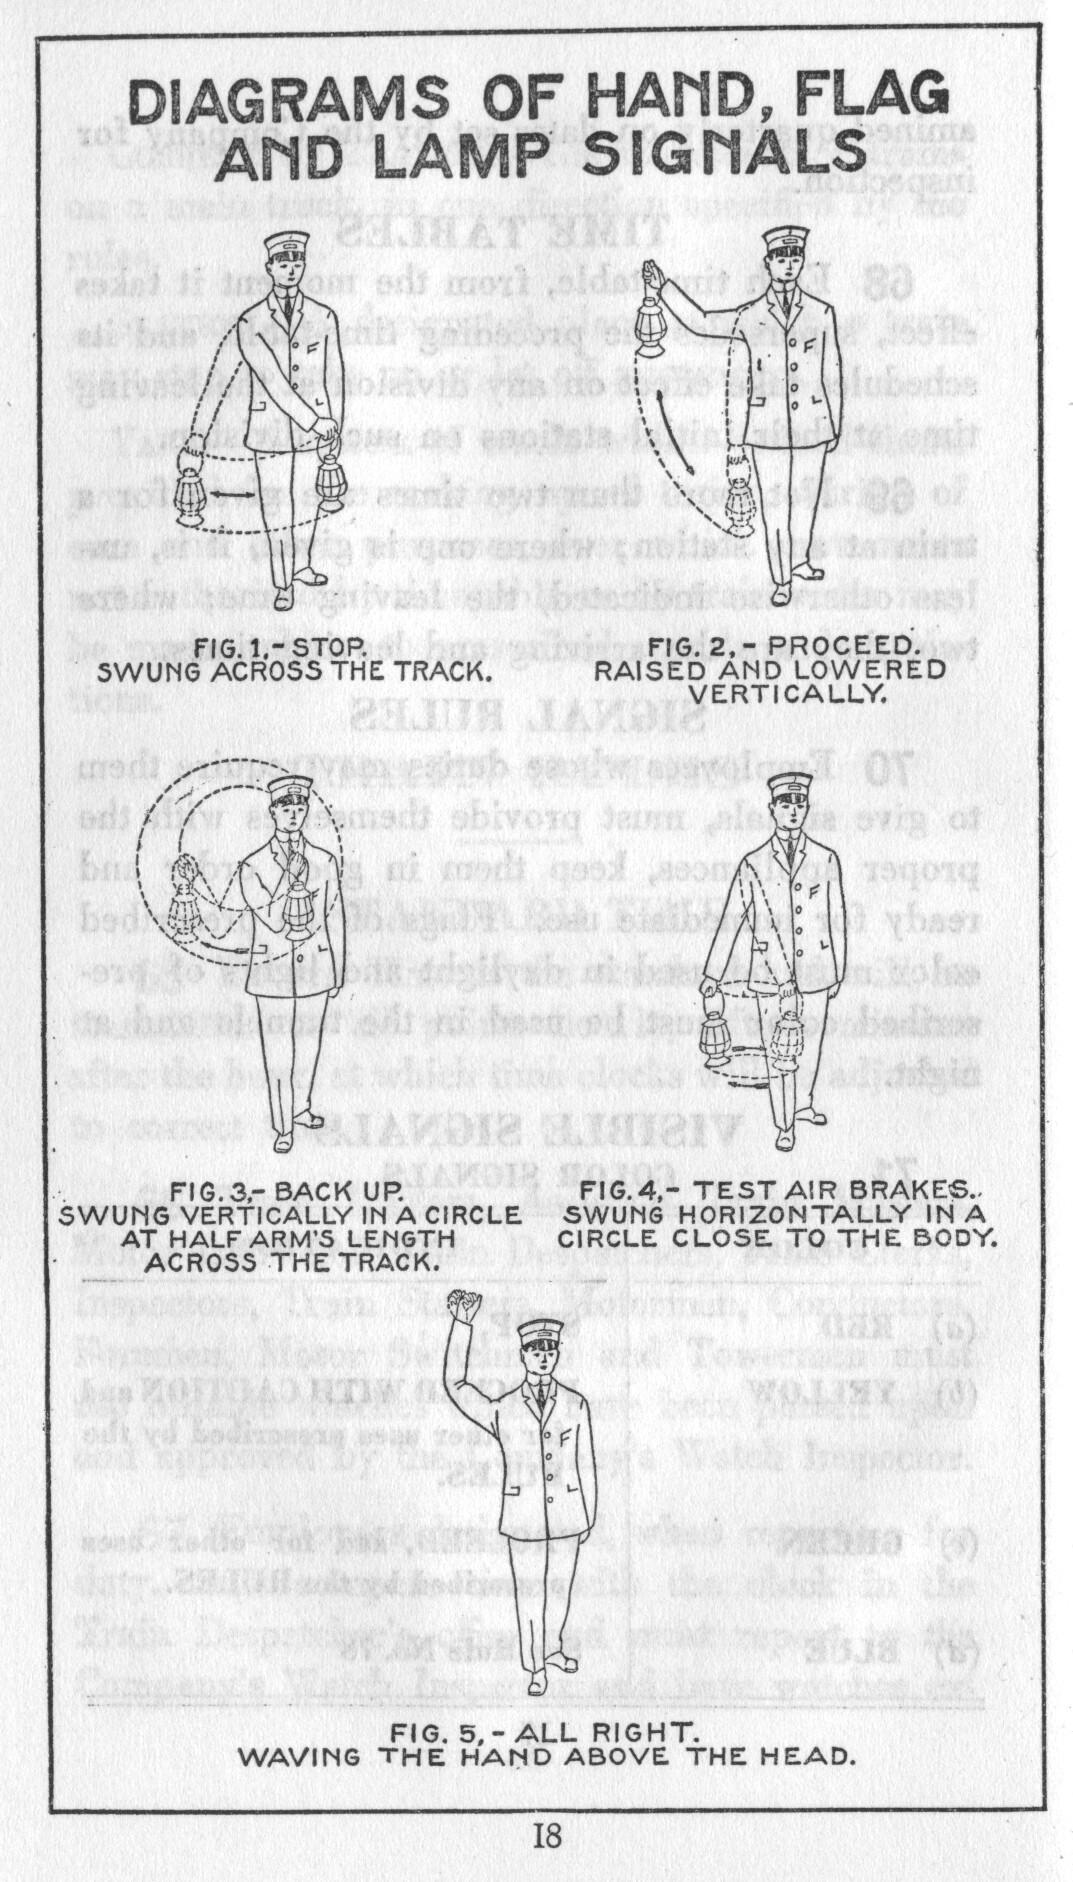 World Nycsubway Org Hudson And Manhattan Rules And